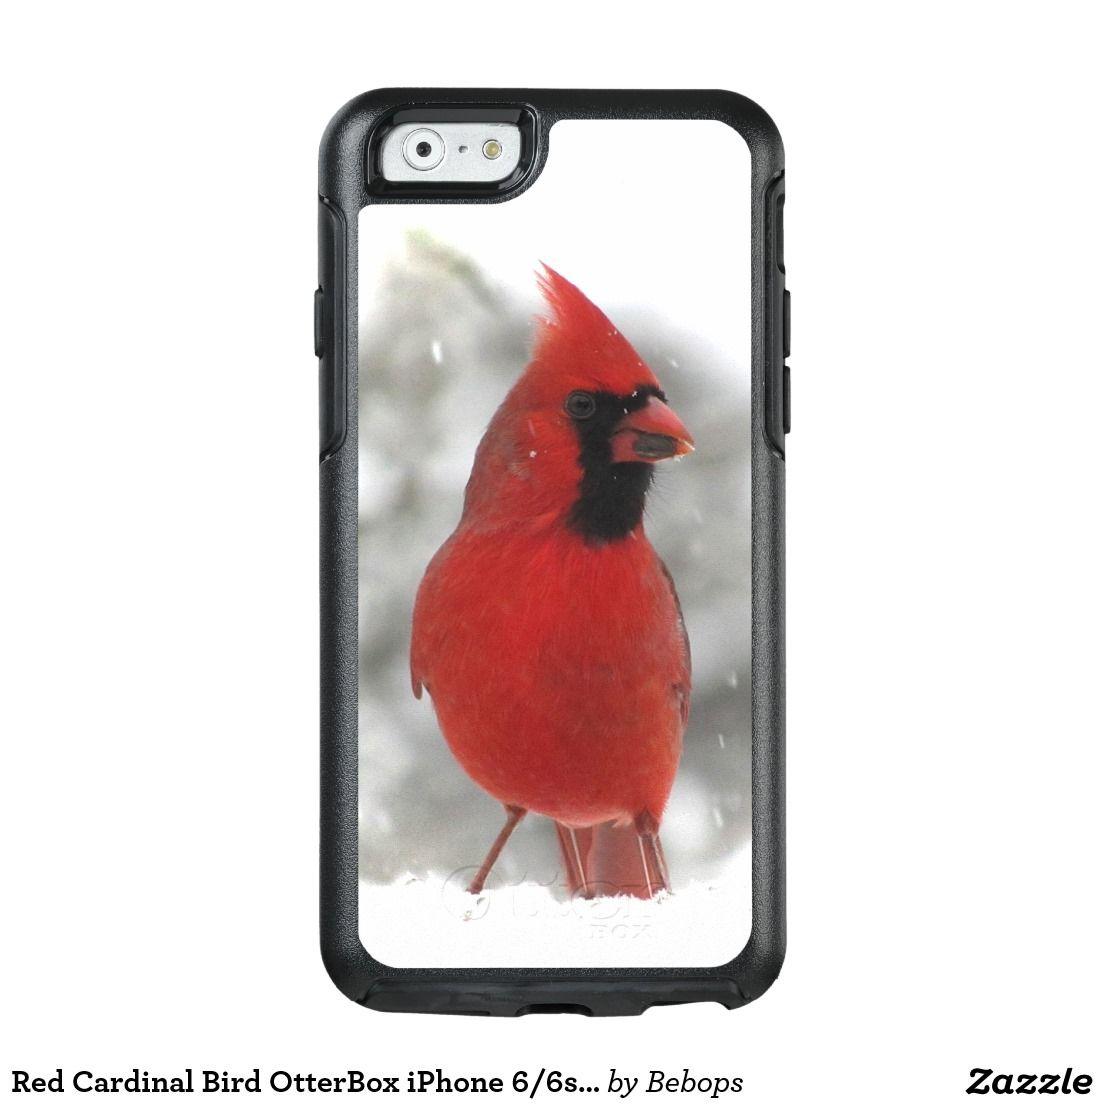 Red Cardinal Bird OtterBox iPhone 6/6s Case